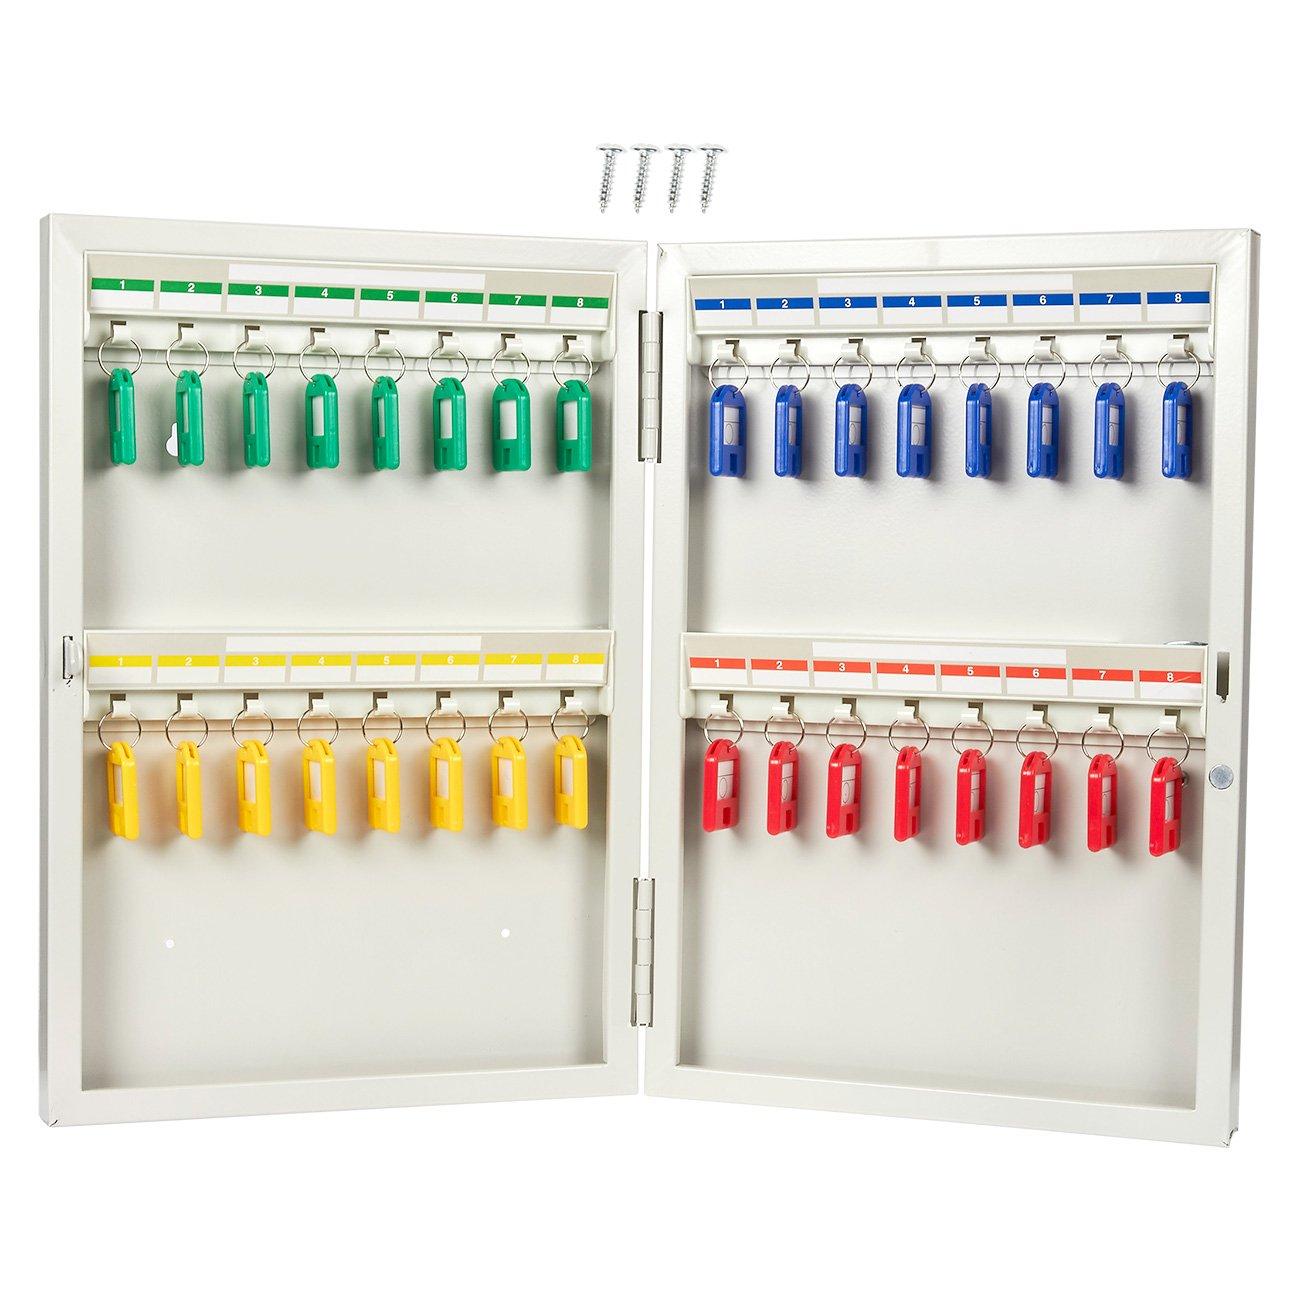 Key Cabinet - Steel Key Storage Locker - Wall Mounted Key Holder Box for 32 Keys, Includes 32 Key Tags, 10.25 x 15 x 2 Inches by Juvale